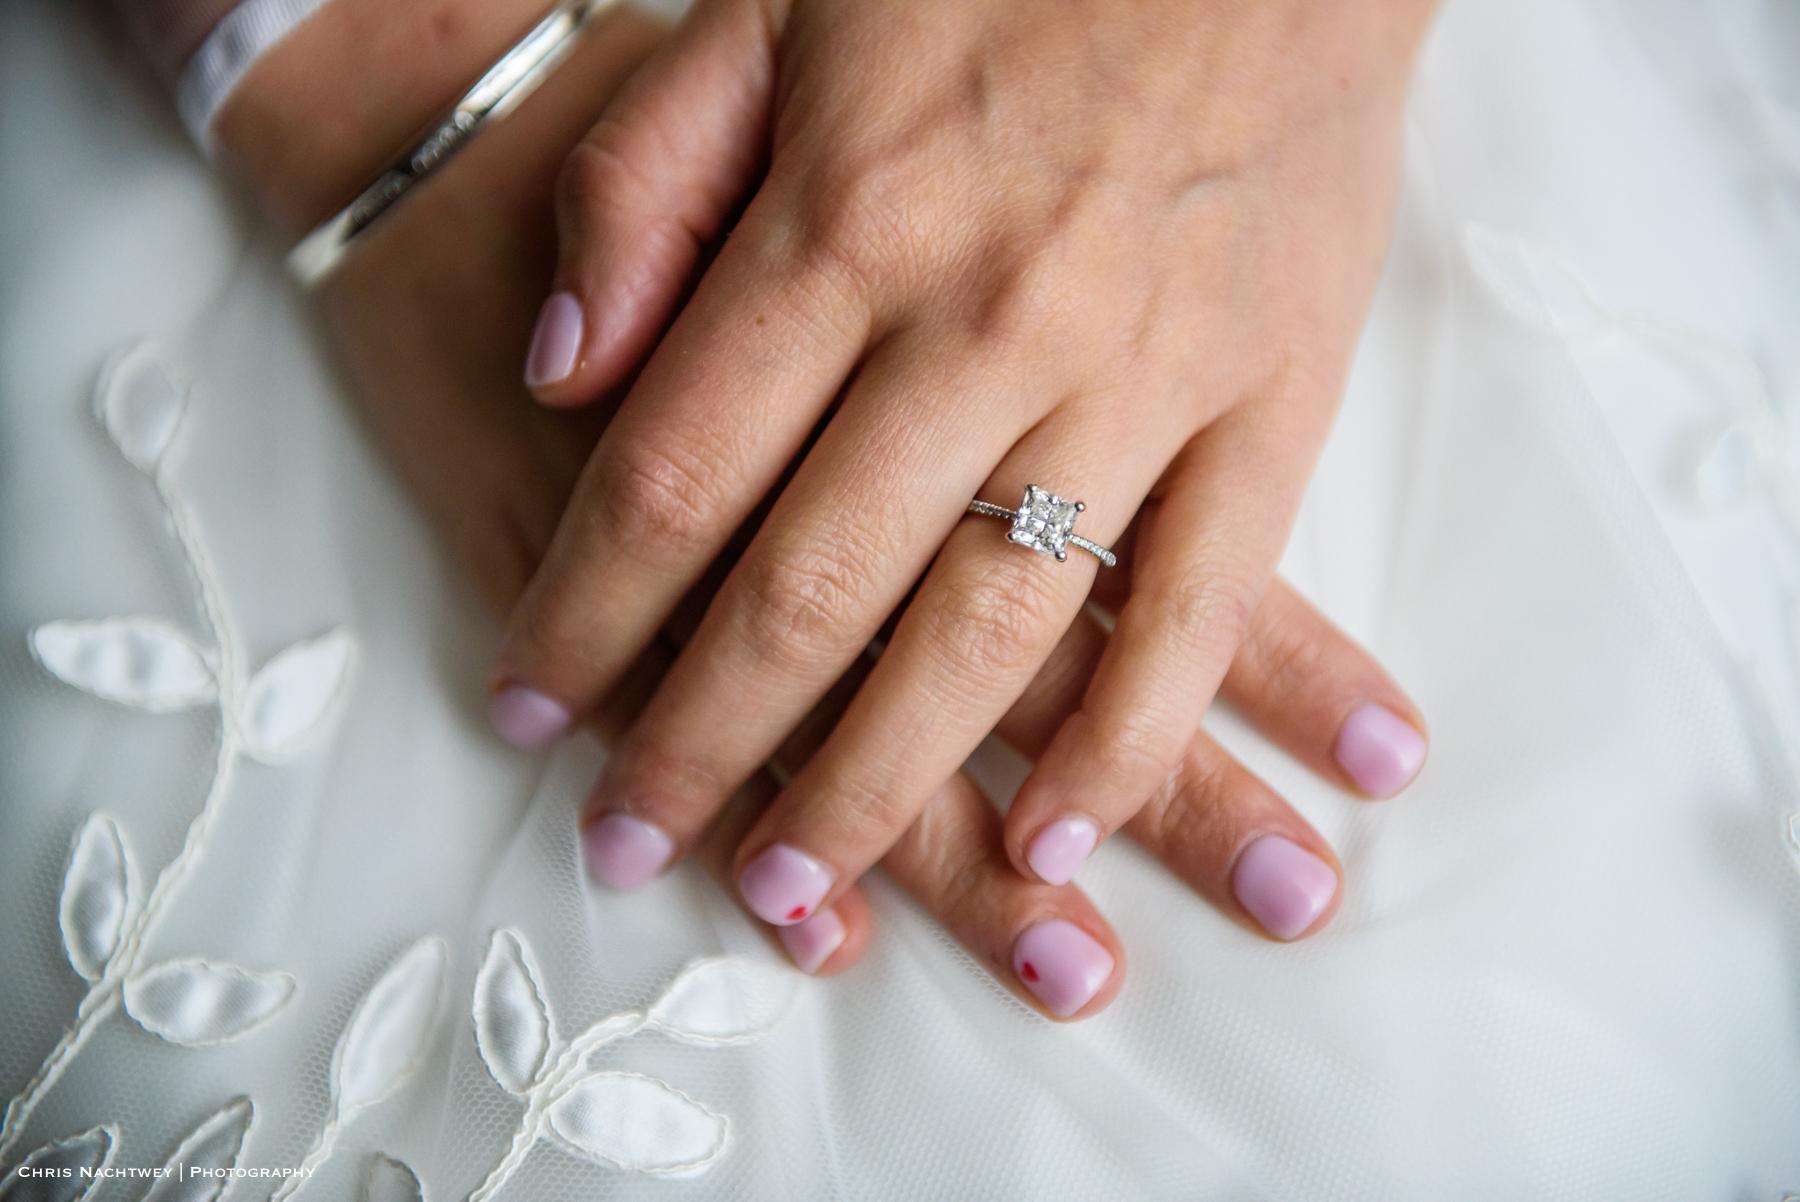 winter-branford-house-wedding-photos-groton-ct-chris-nachtwey-photography-2019-8.jpg